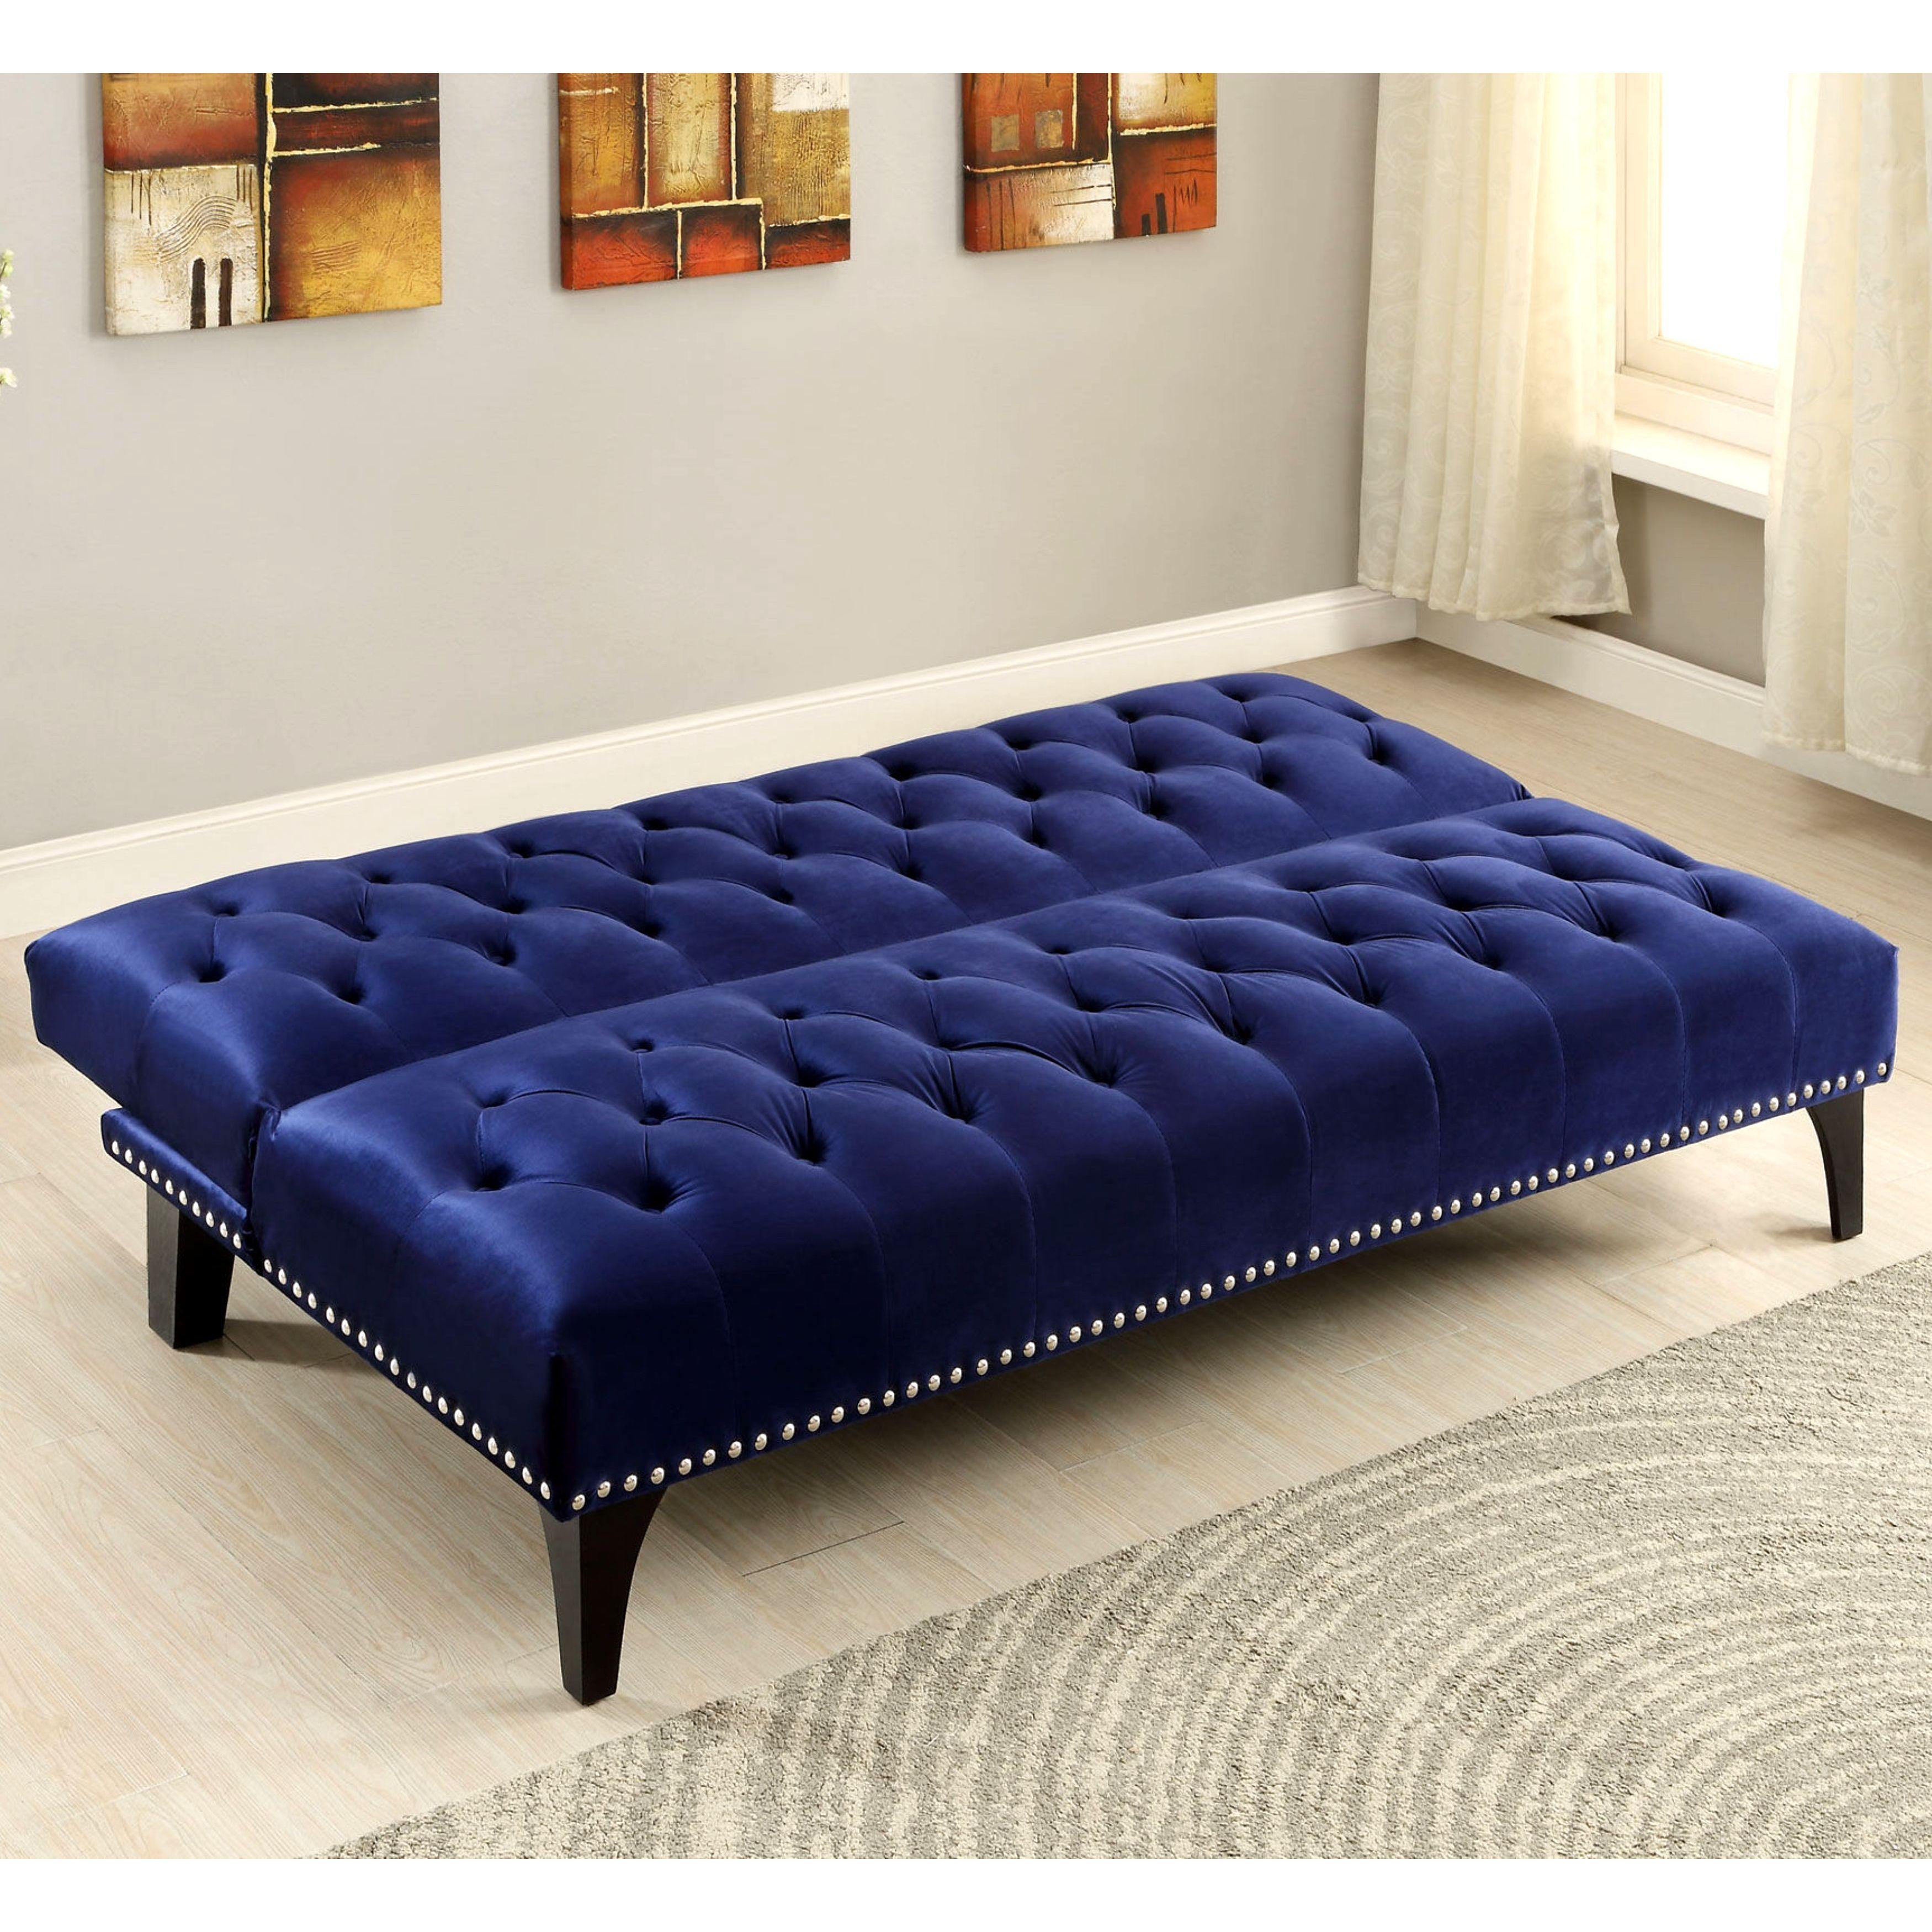 Xnron Button Tufted Royal Blue Velvet Sofa Bed Lounger with Nailhead Trim